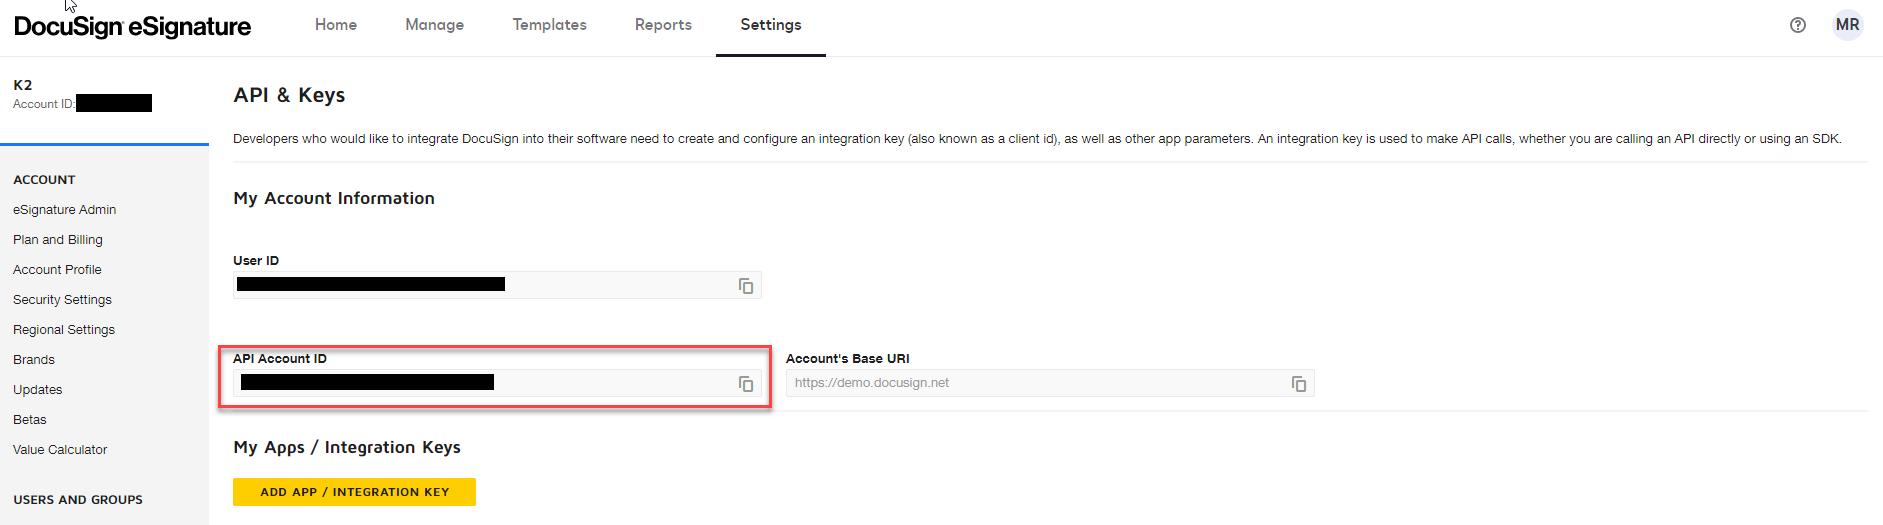 DocuSign Admin Site – API & Keys – API Account ID